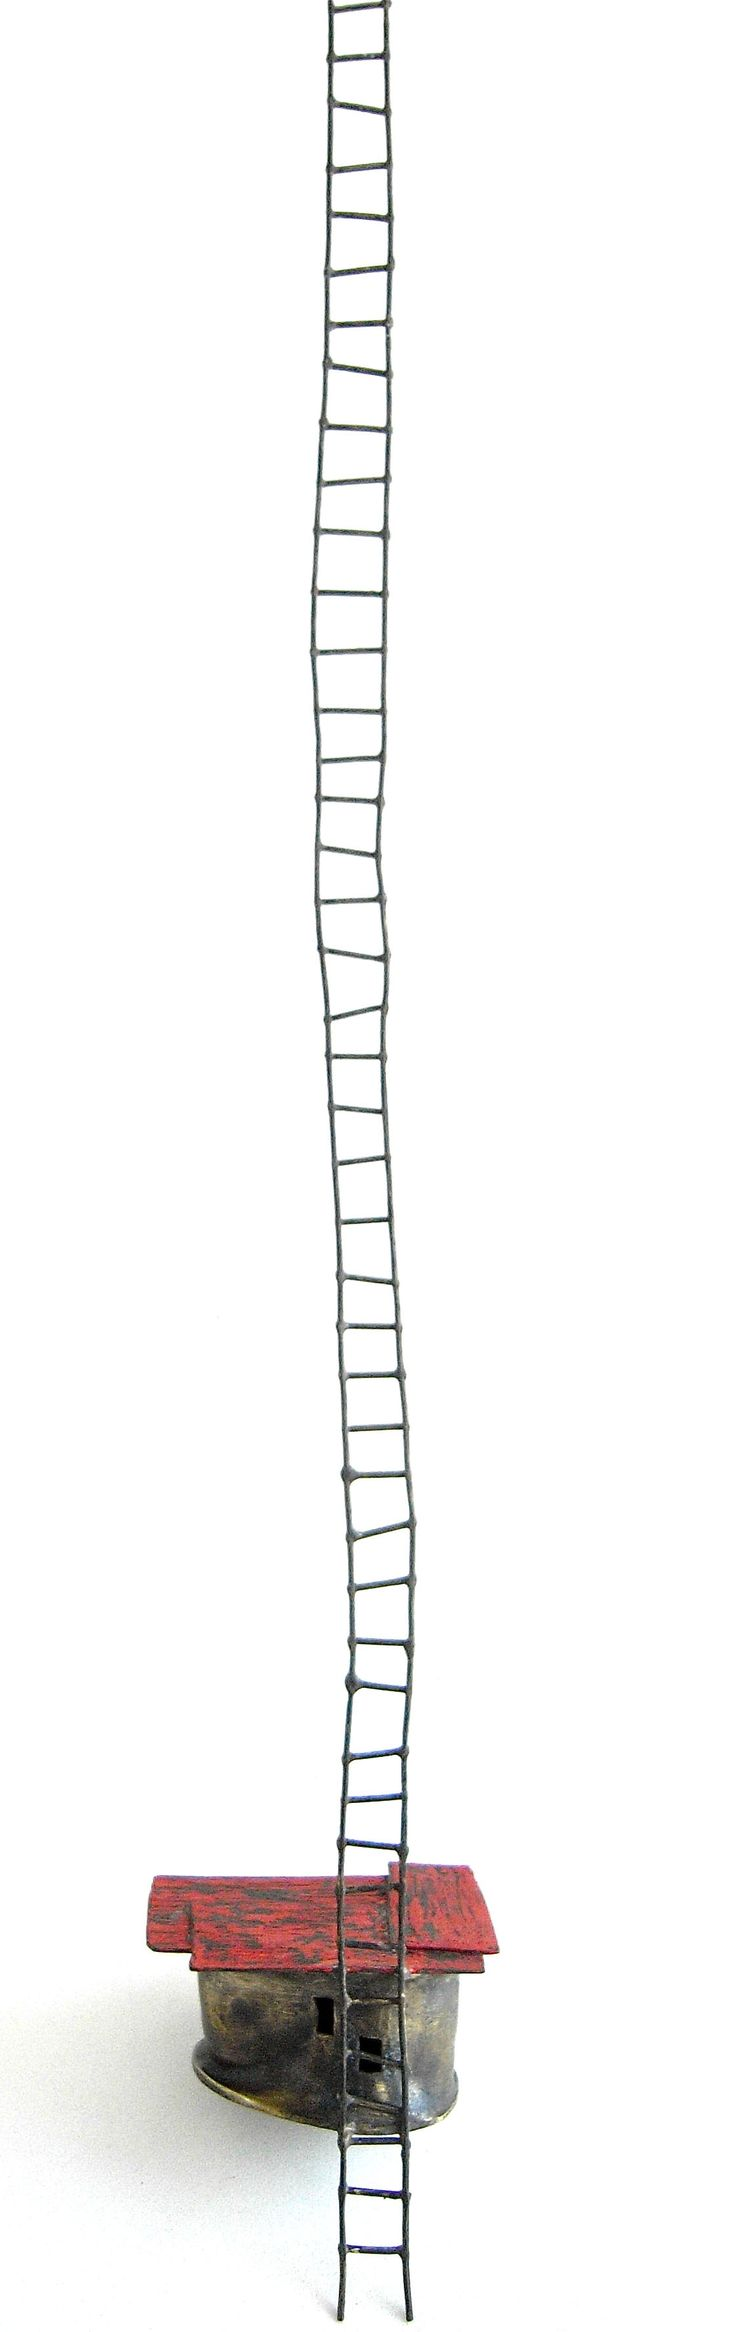 LIISA HASHIMOTO-JAPAN[ House with Ladder ] HiNGE Dept.